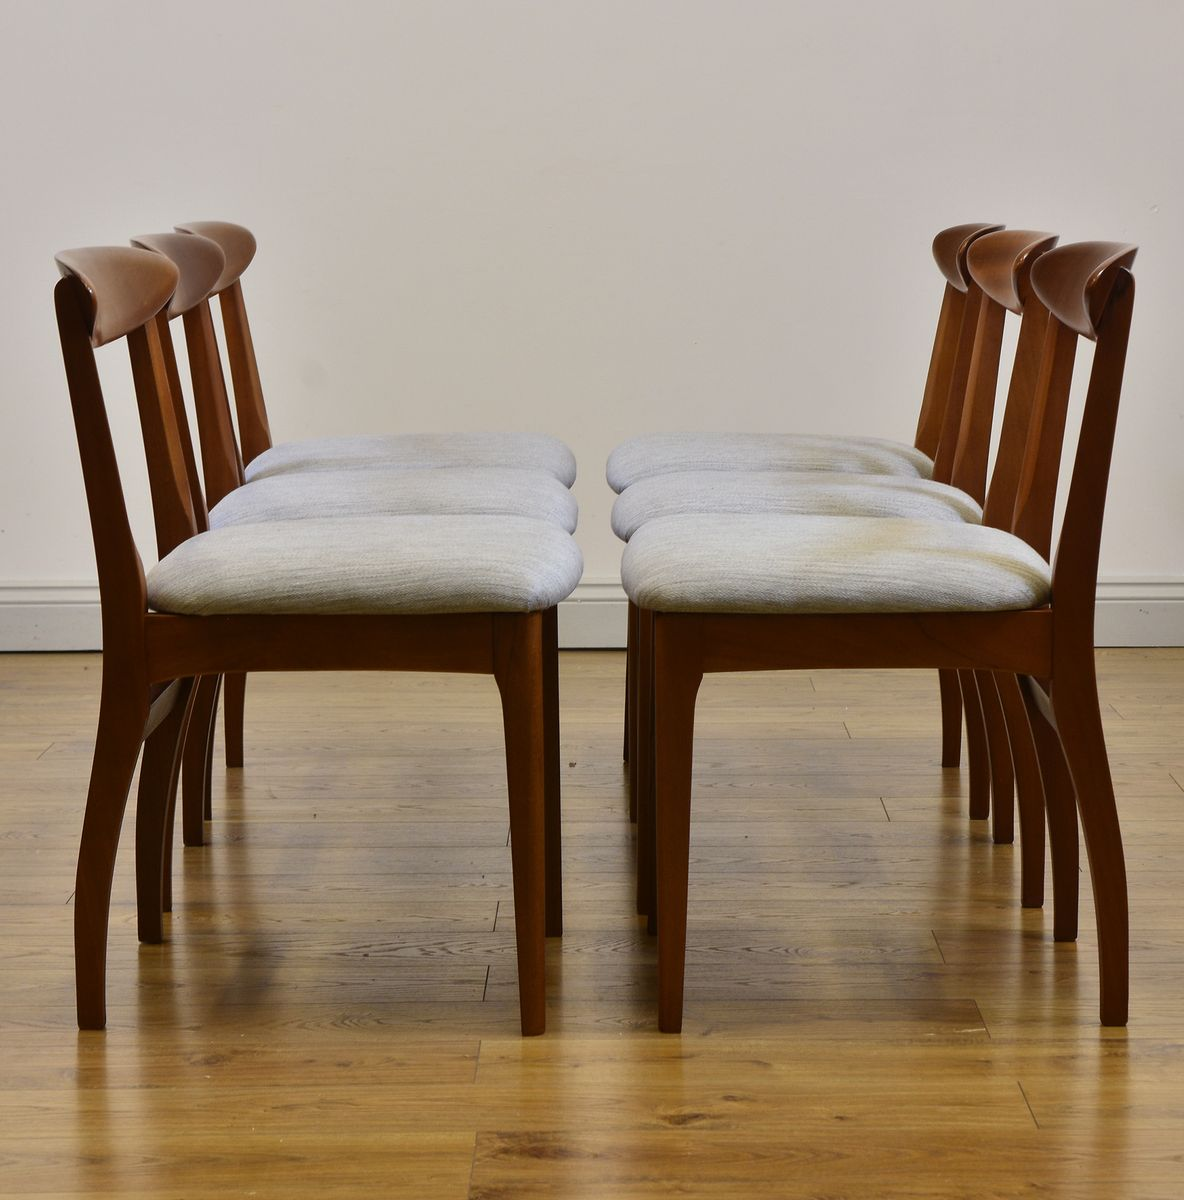 Sedie da pranzo MidCentury in teak anni 60 set di 6 in vendita su Pamono